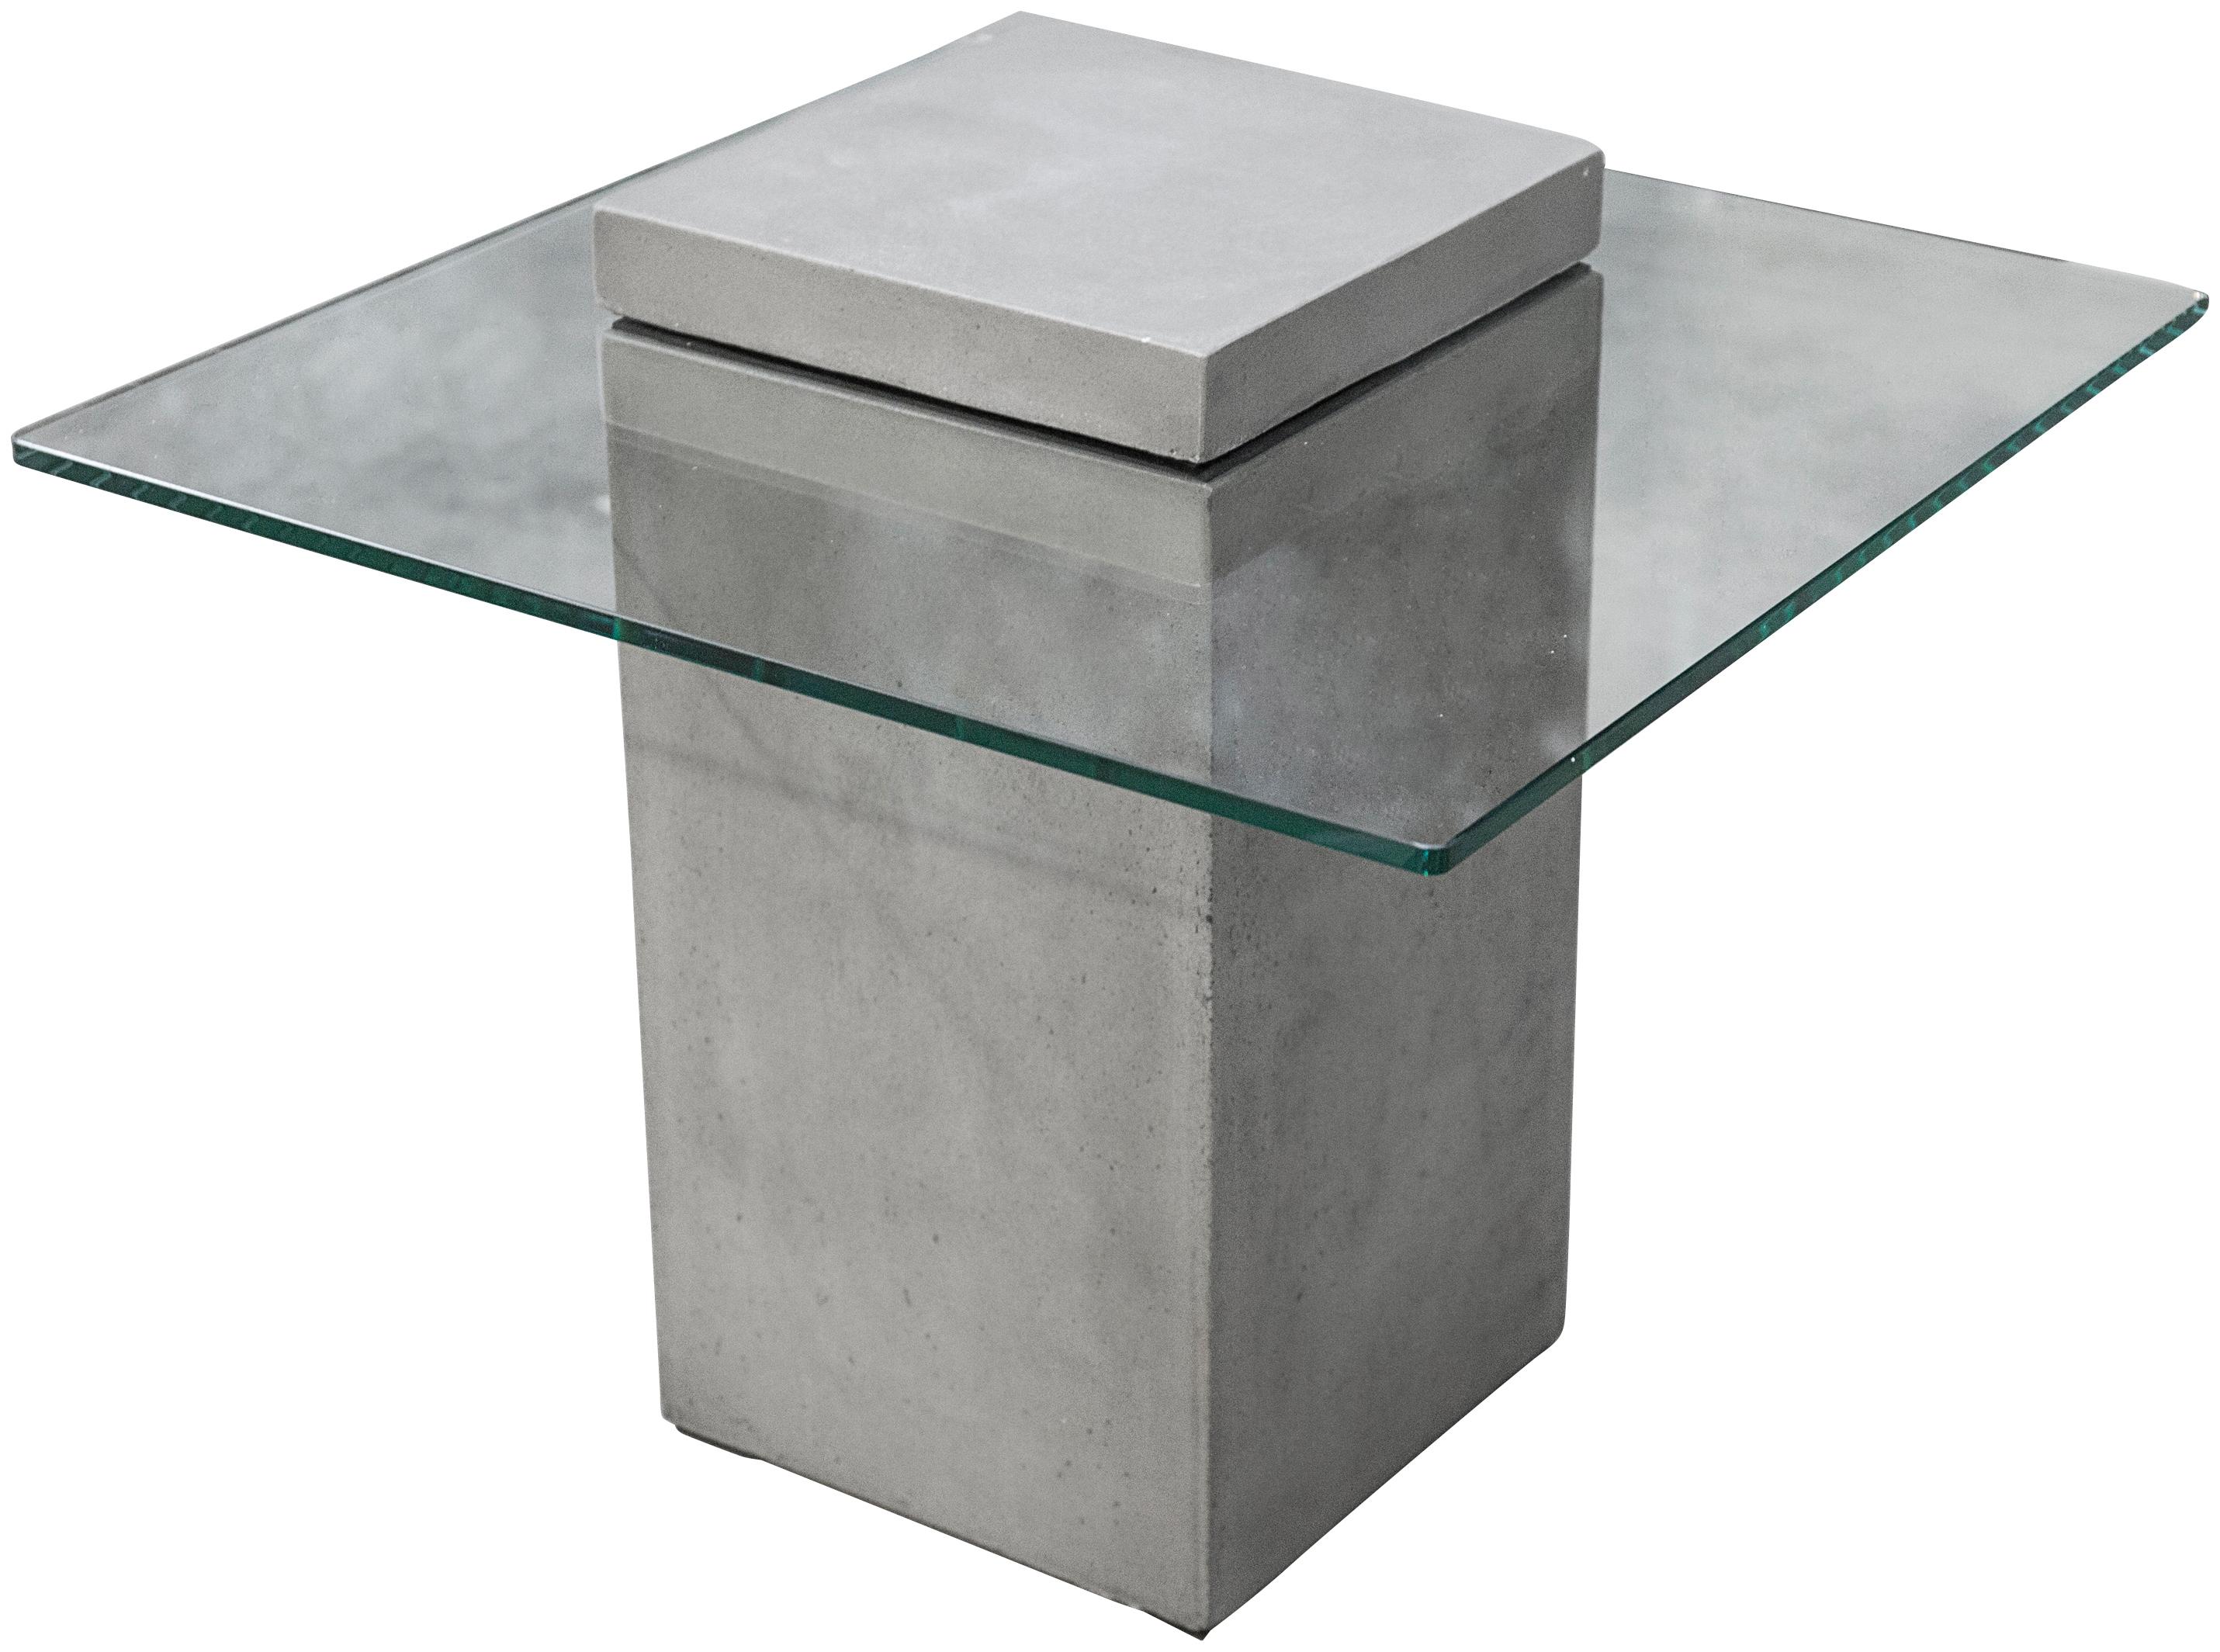 Image of ANDIAMO Gartentisch »Vitrum«, 2-tlg., Beton/Glas, Masse (B/H/T) 55x28x55 cm